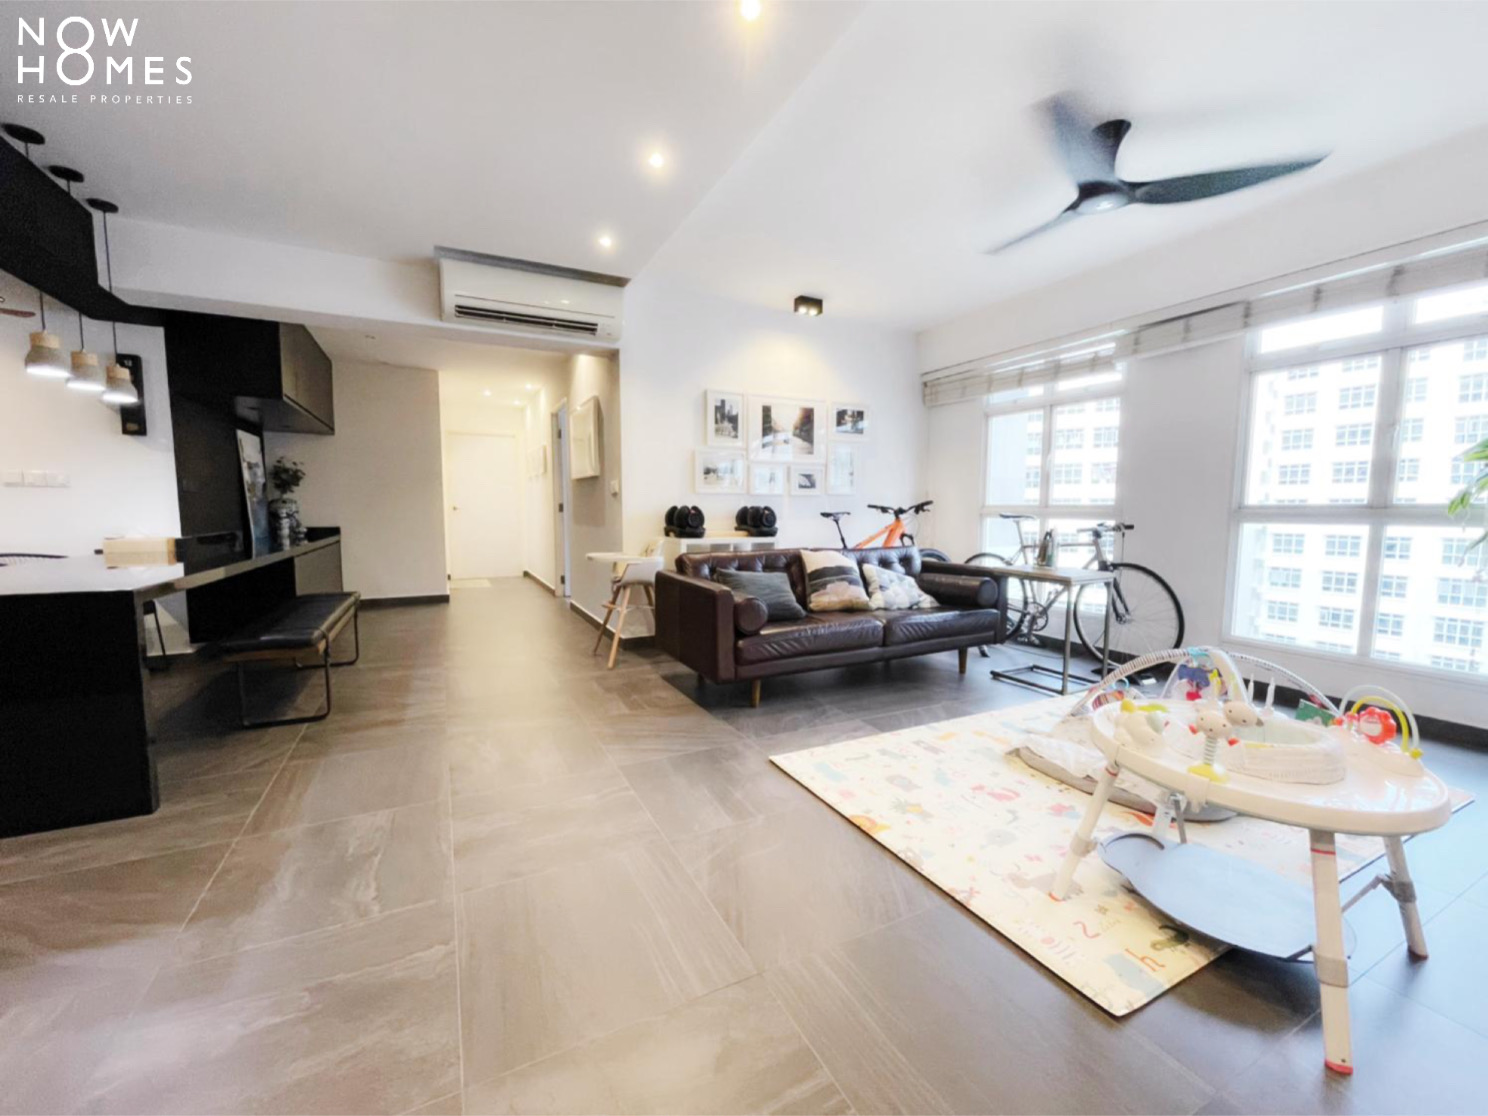 sengkang resale property - 288 compassvale - Living Room with Fan